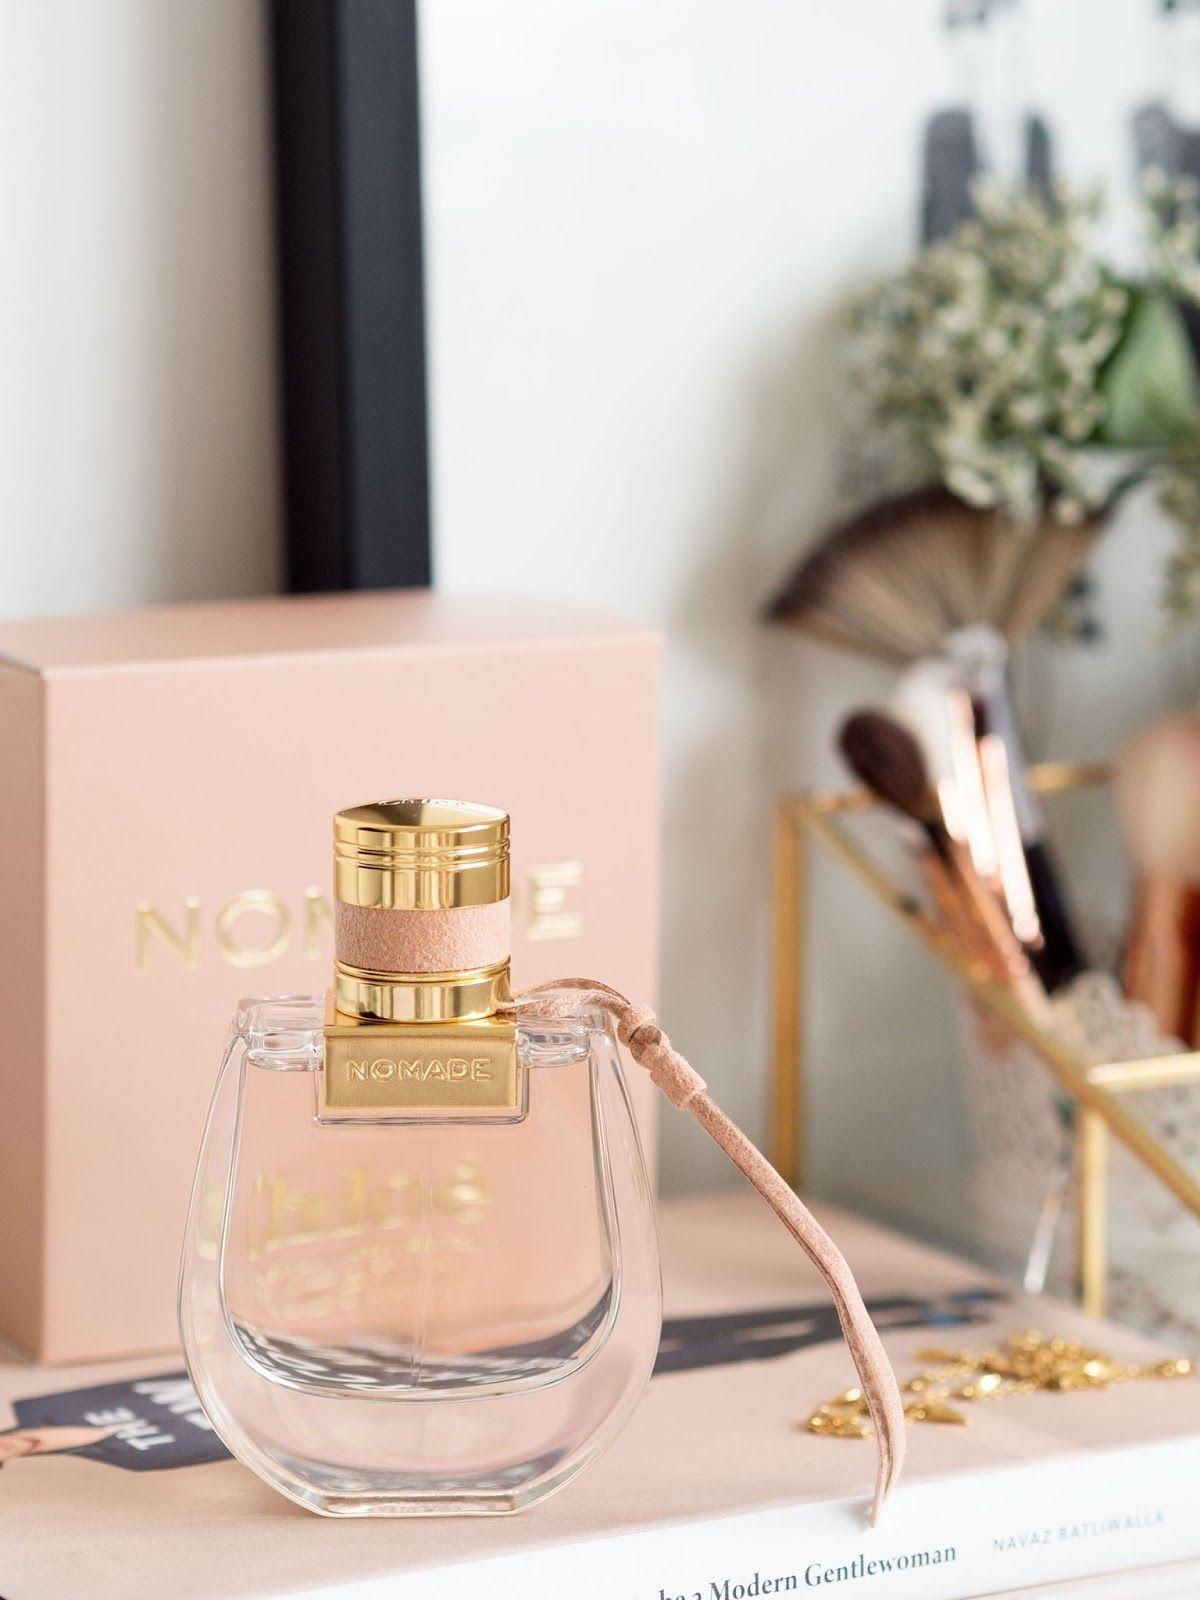 Parfum Perfume In Nomade Chloe Eau 2019Fragrances De dBoCxWer